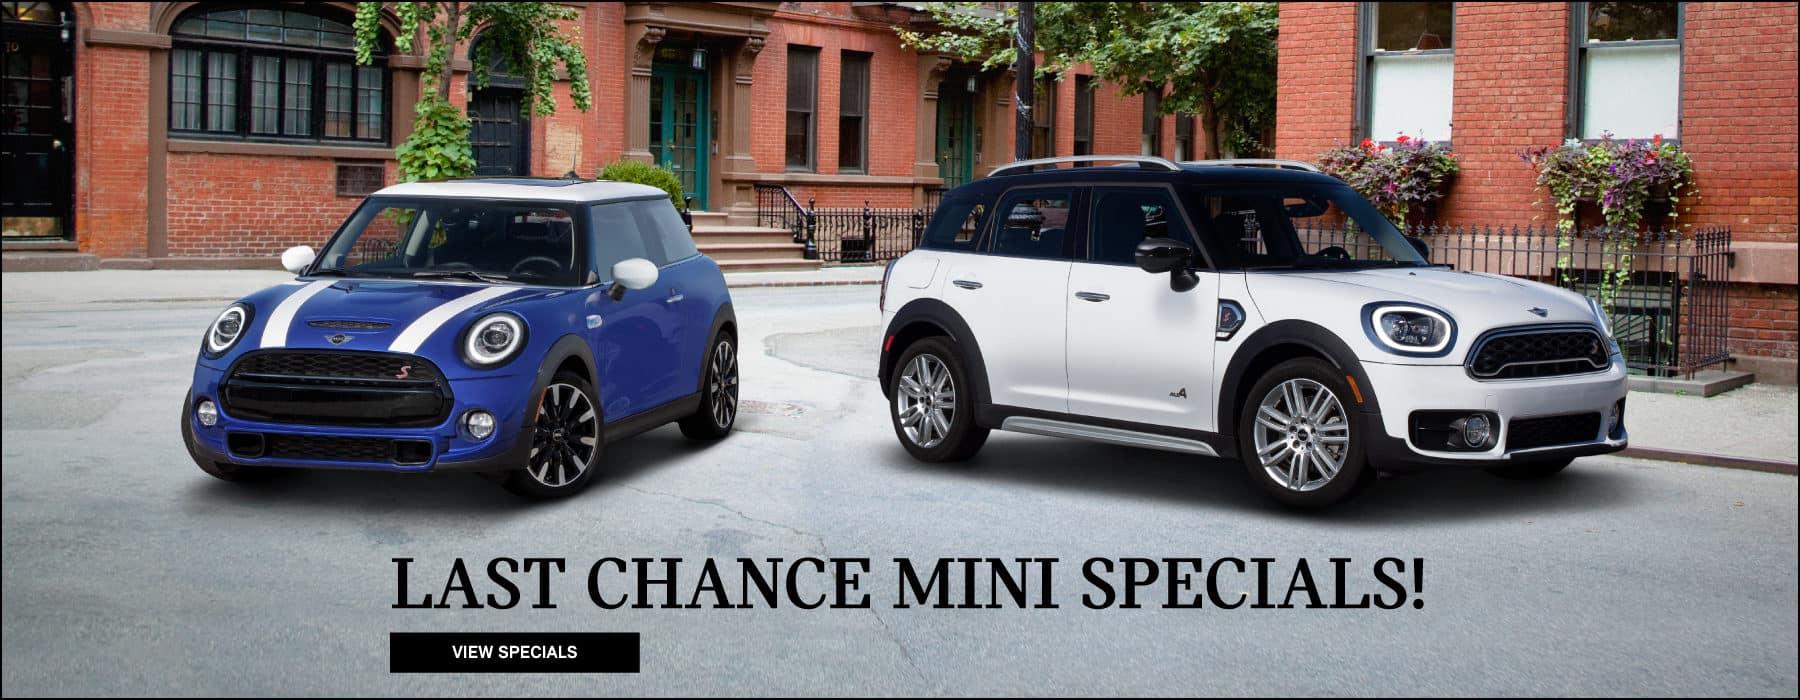 Last Chance MINI Specials